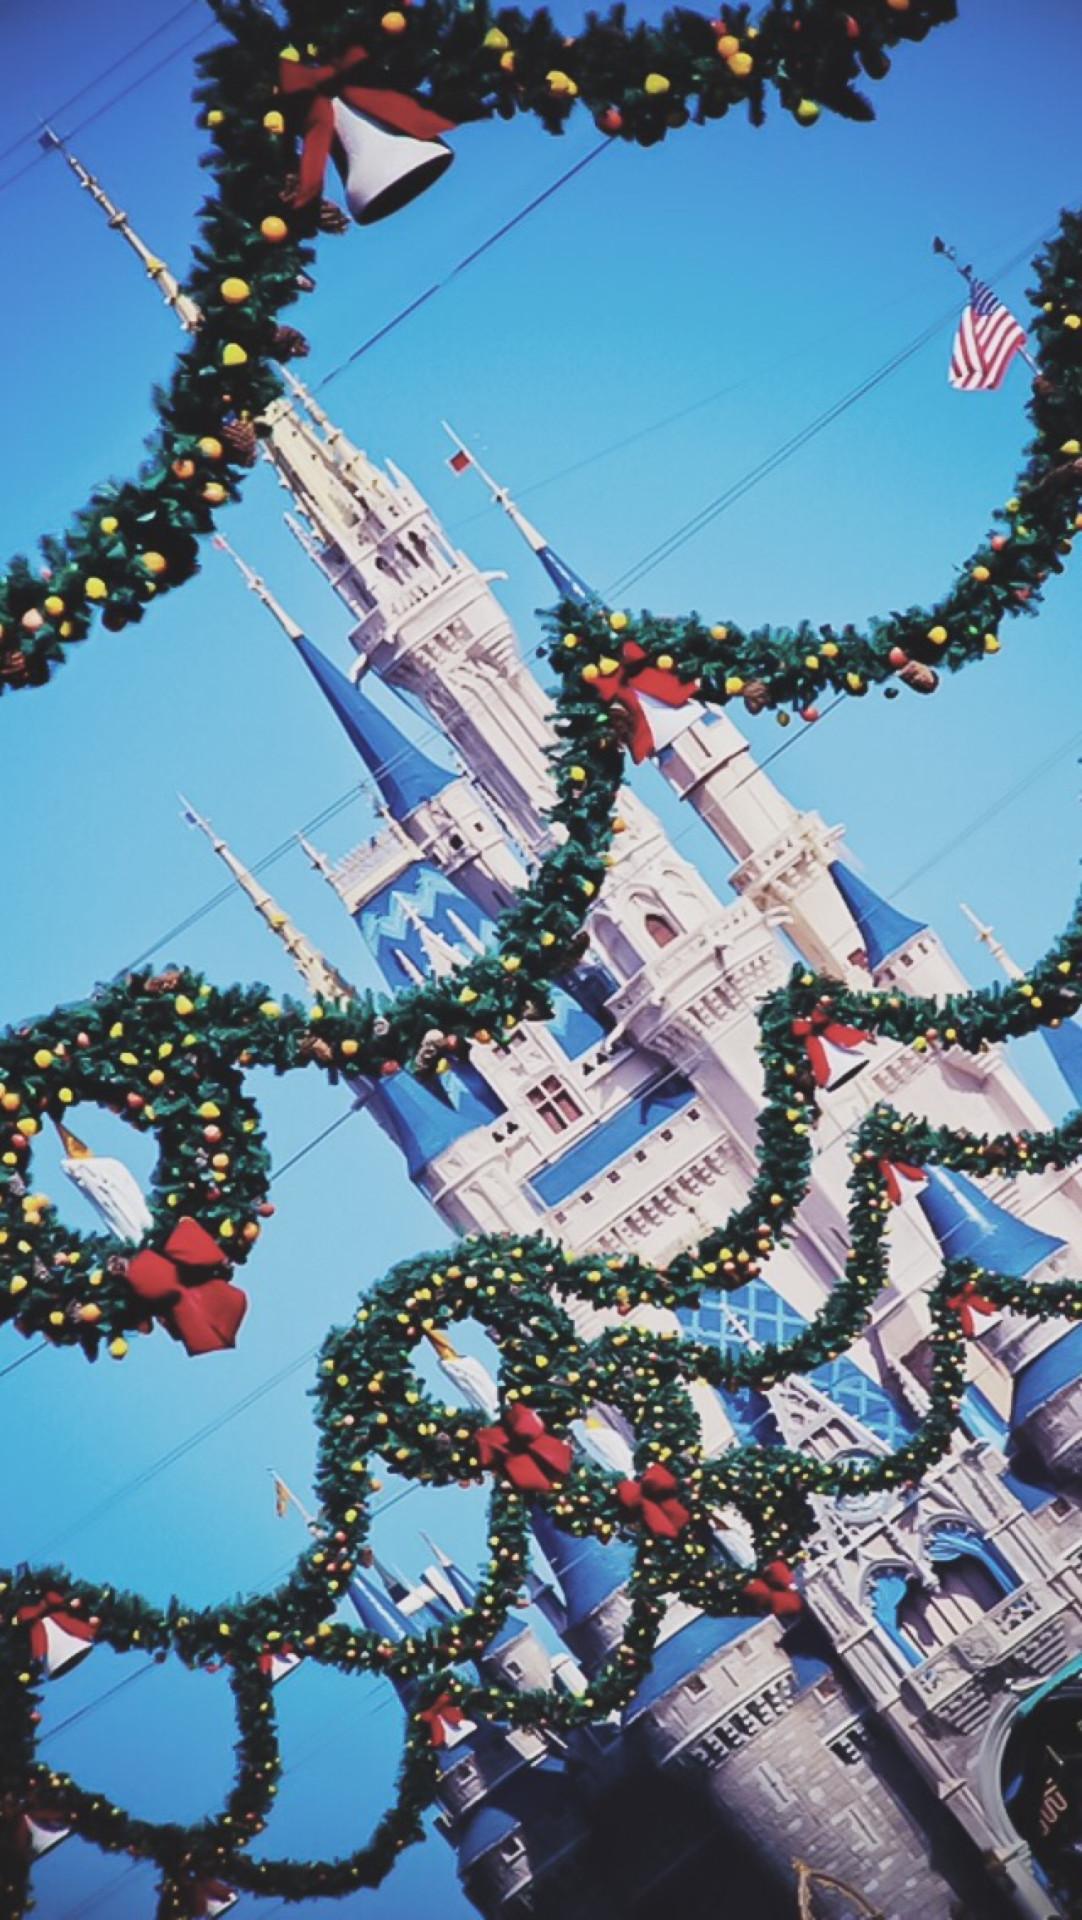 Winter / Christmas backgrounds • like if you save/use